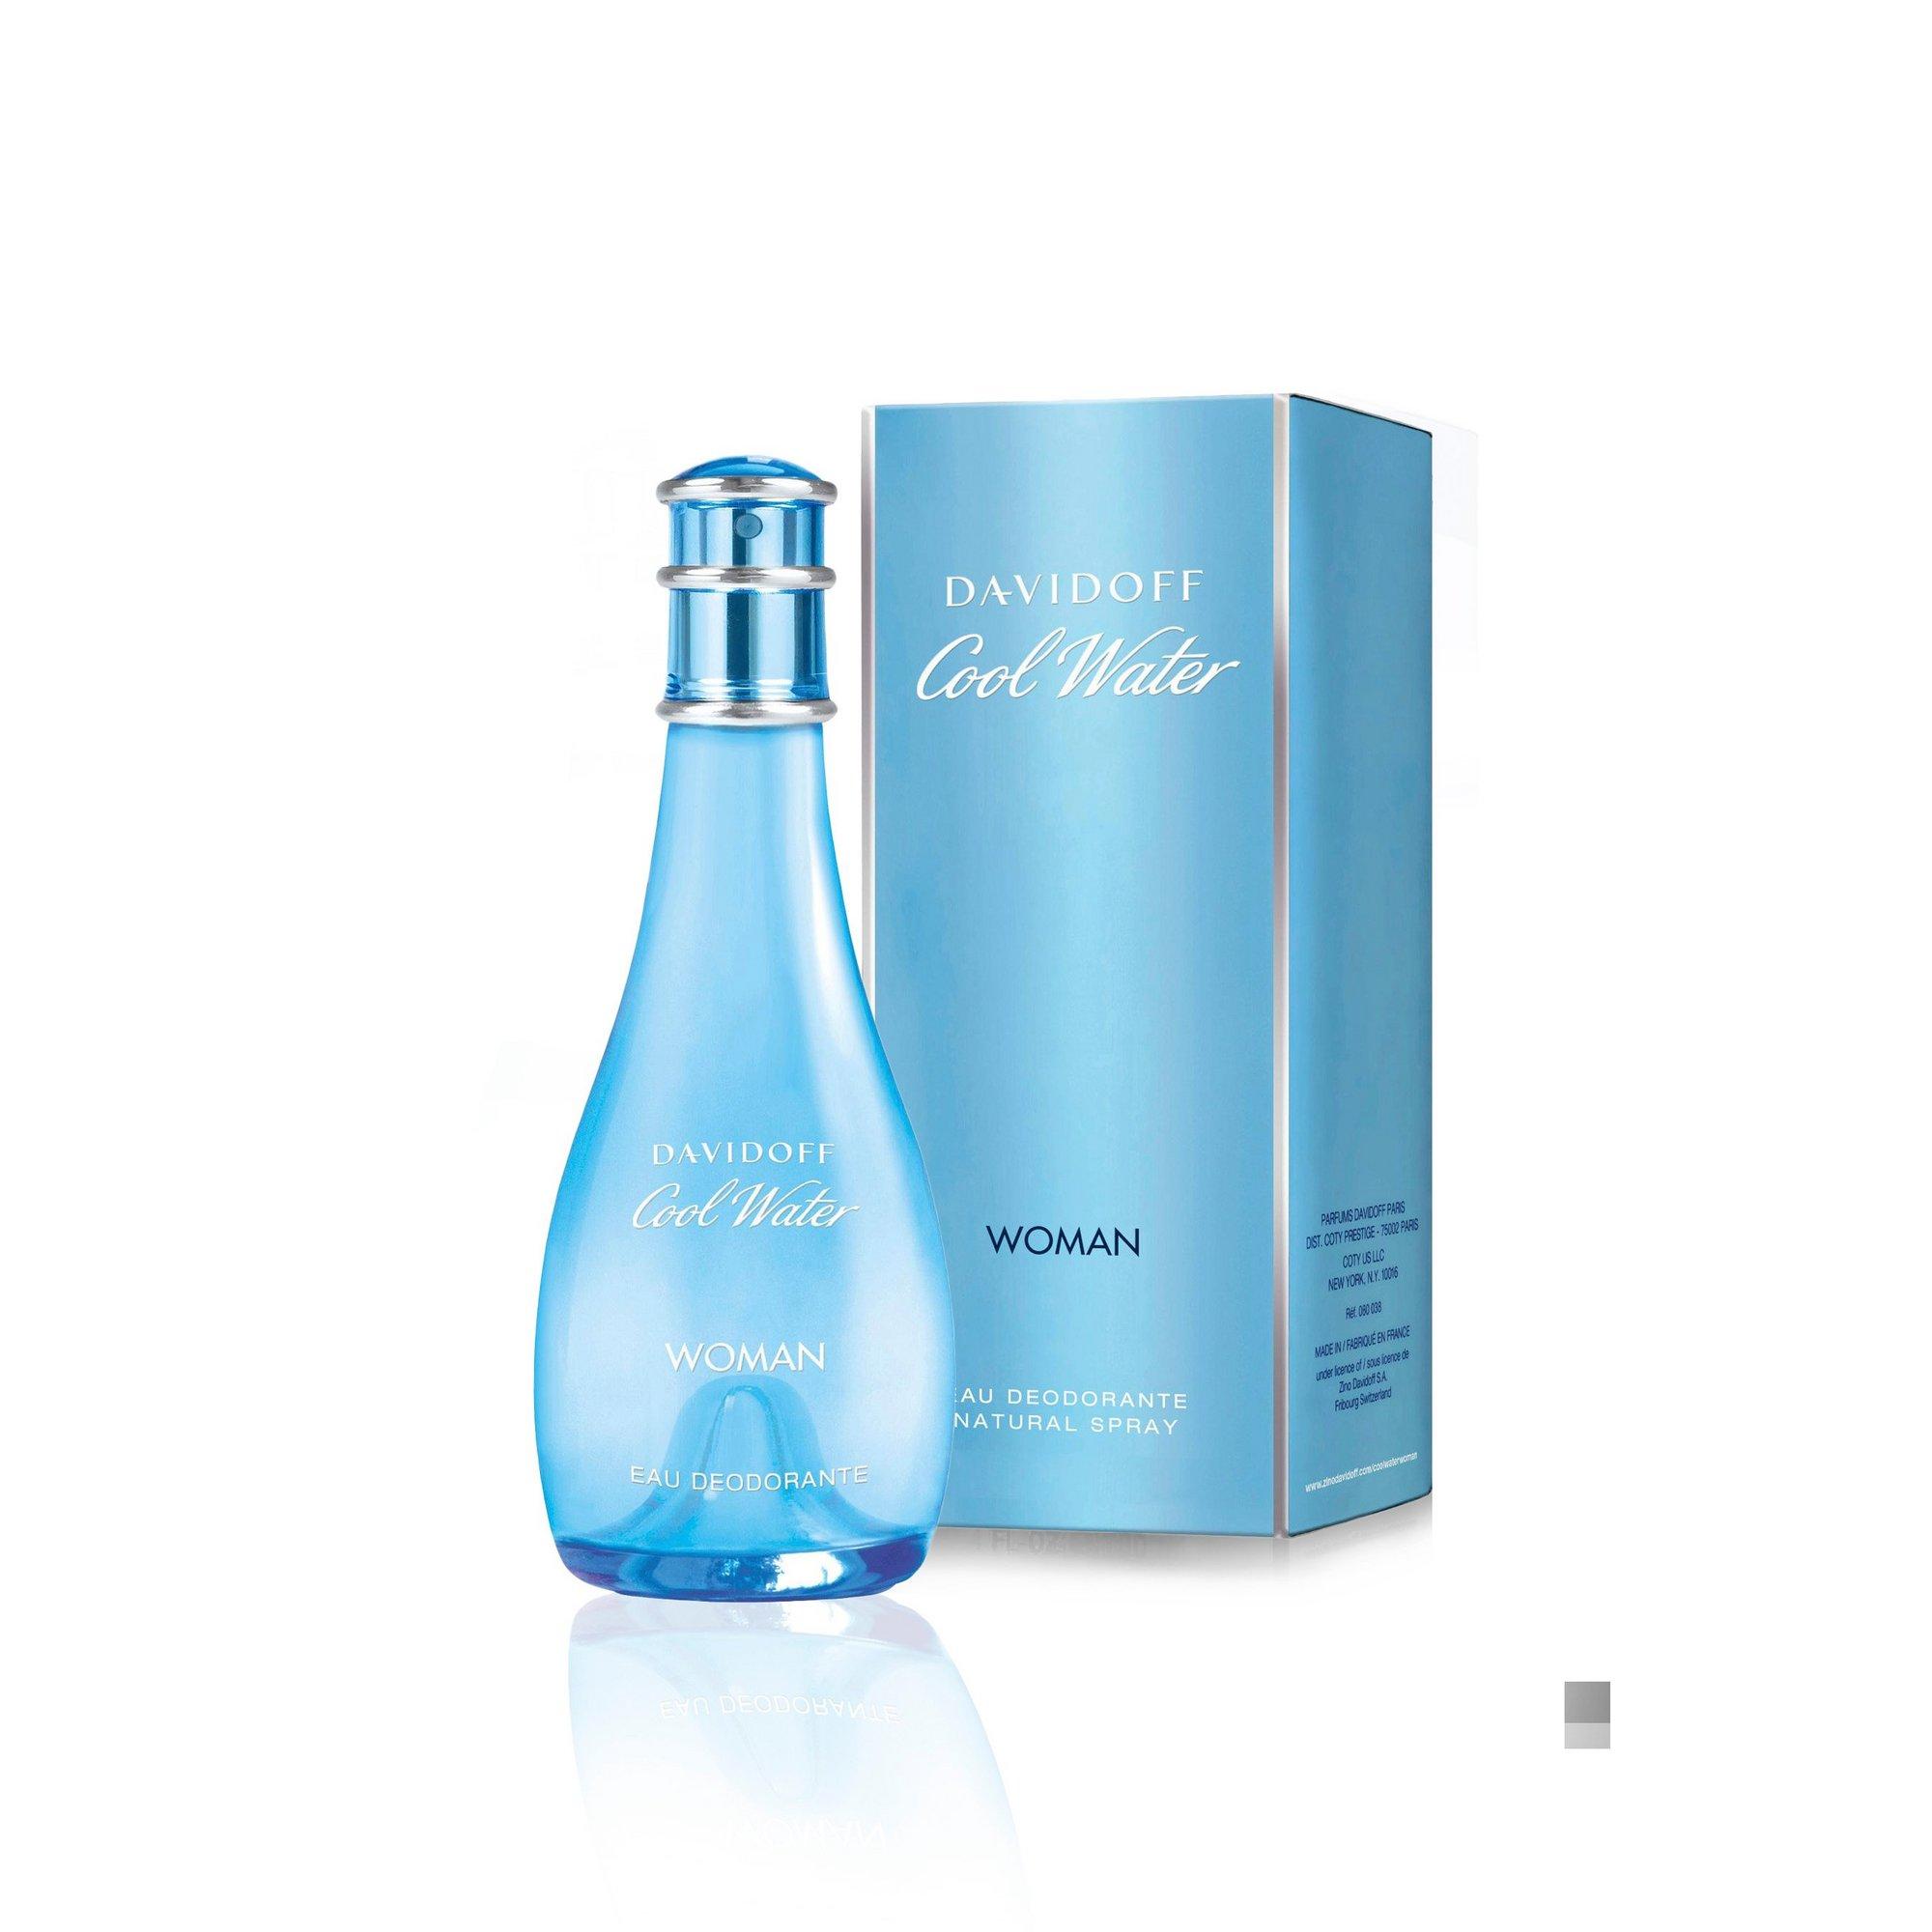 Image of Davidoff Cool Water 100ml Deodorant